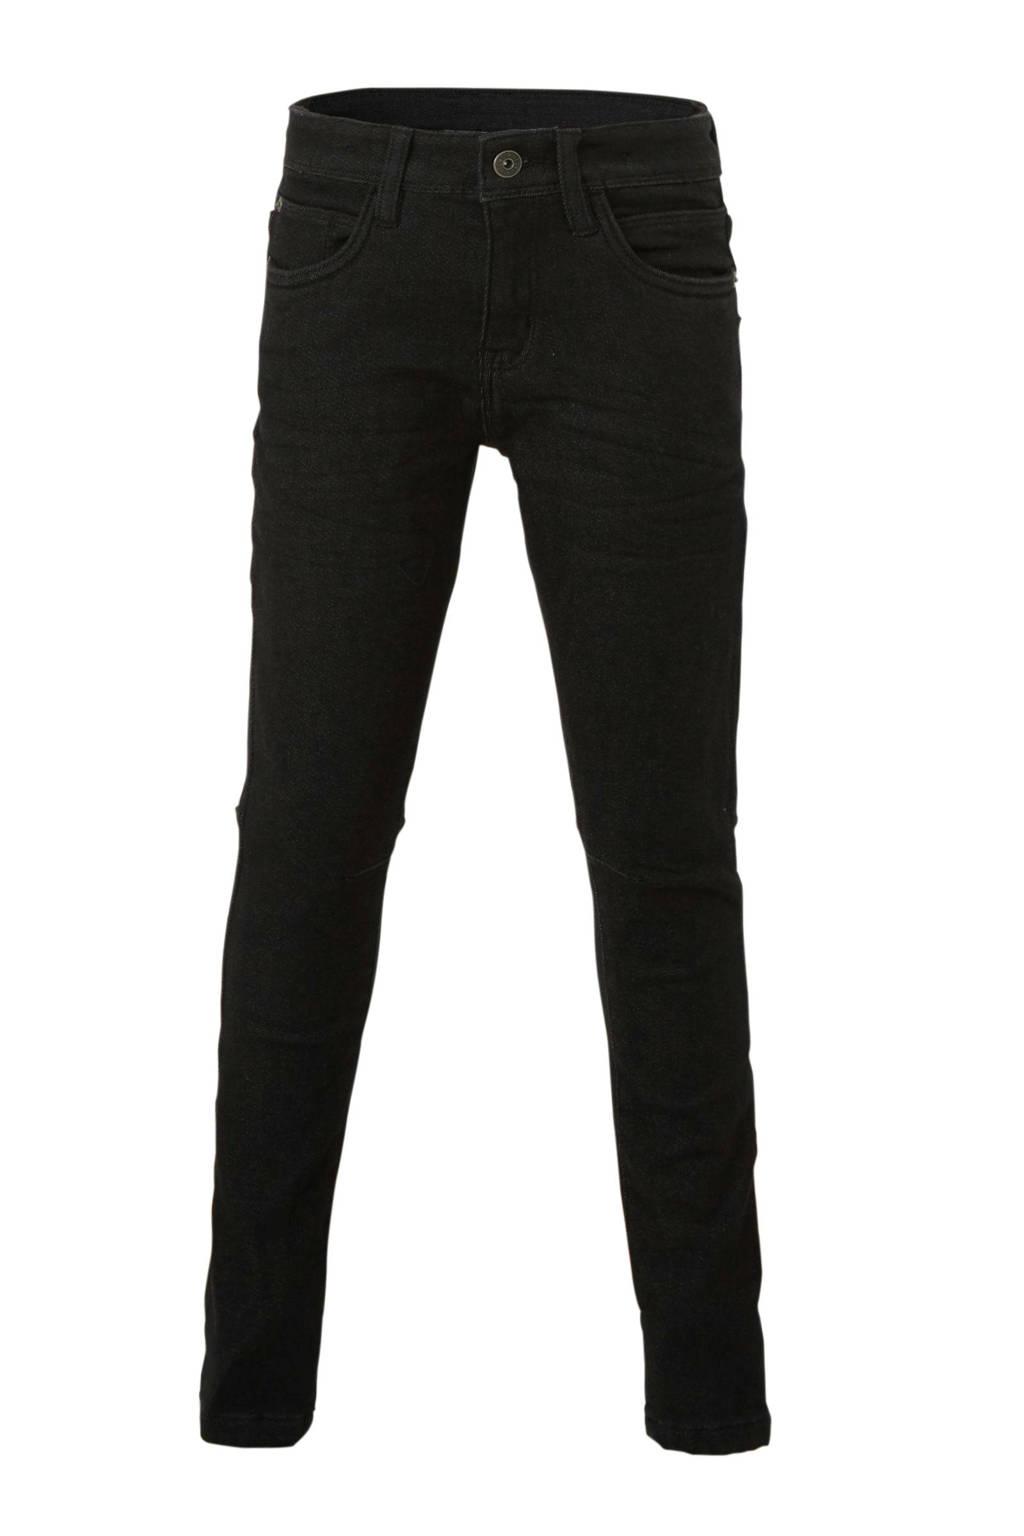 C&A Here & There skinny broek zwart, Zwart